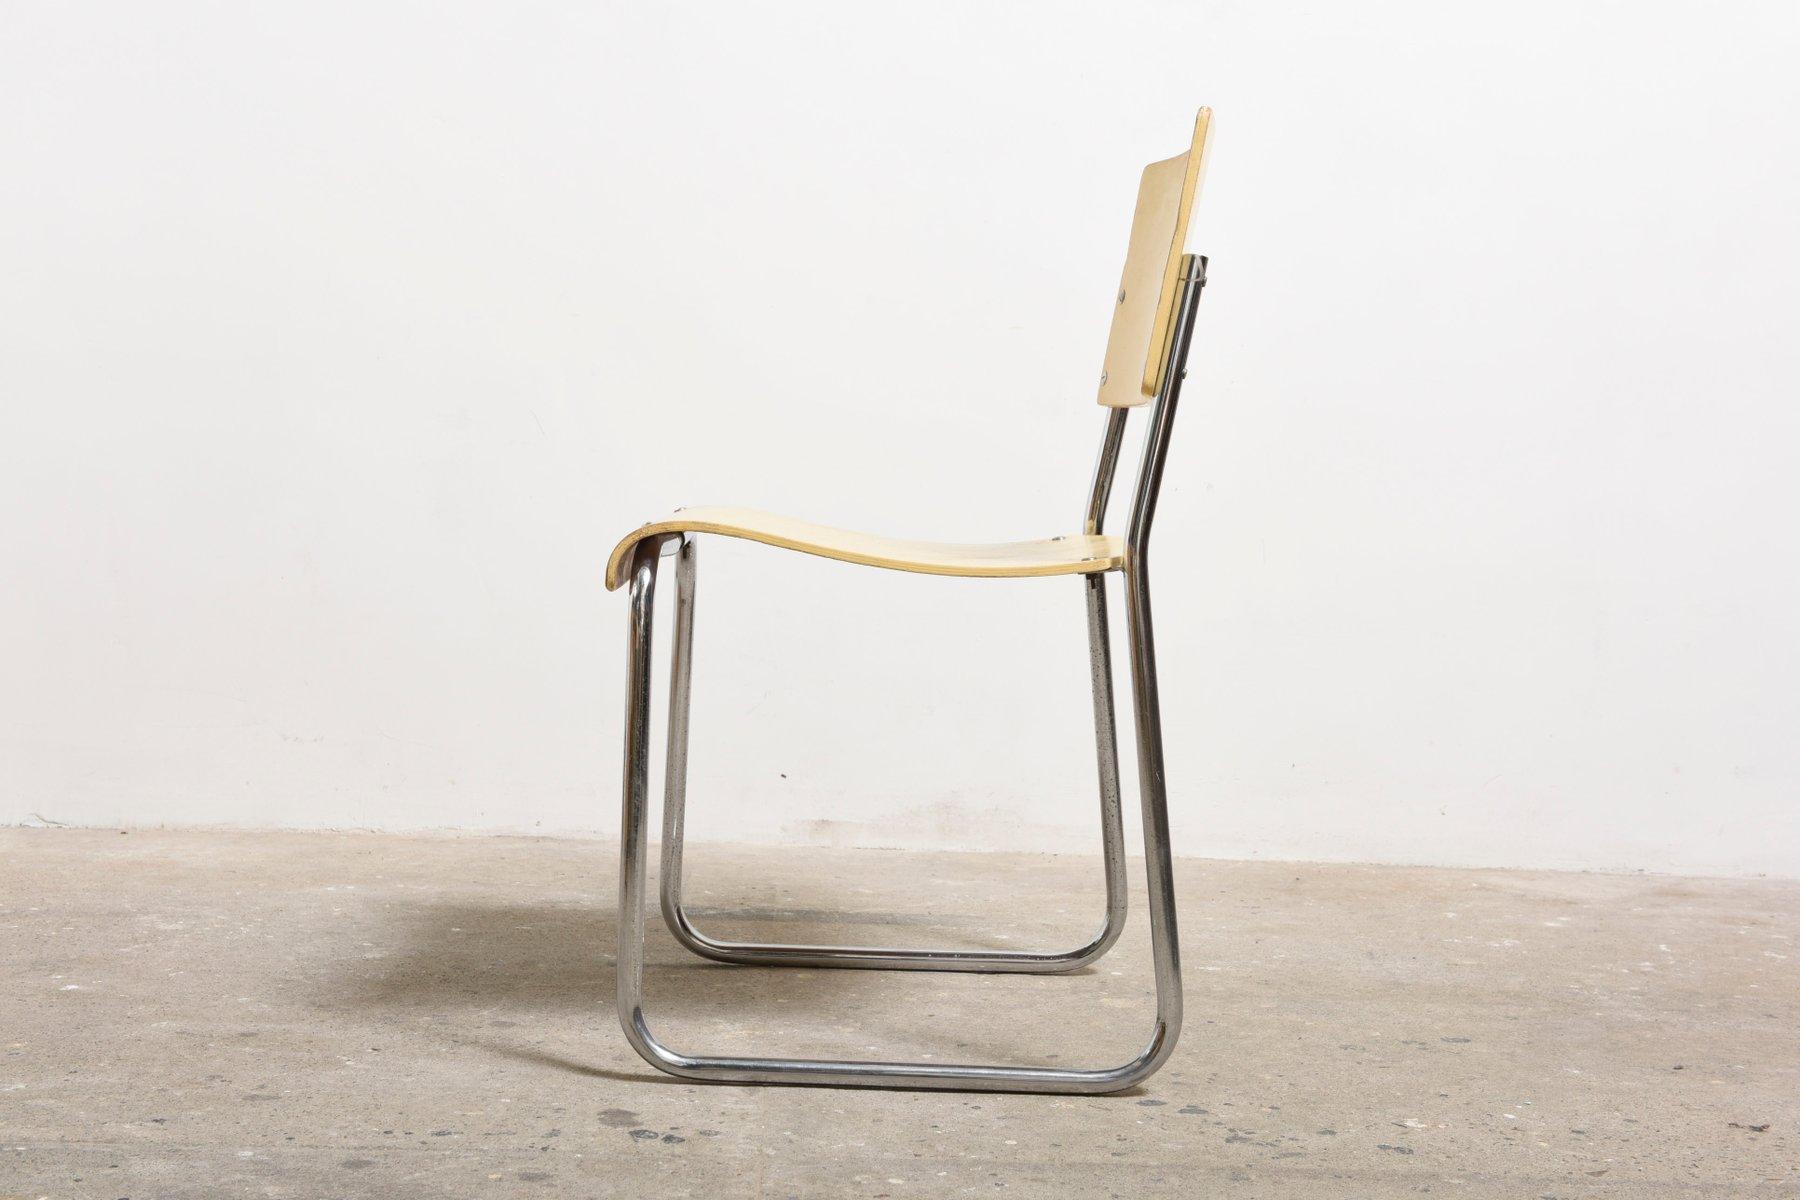 Bauhaus chair 1920 - German Art Deco Bauhaus Chairs 1920s Set Of 6